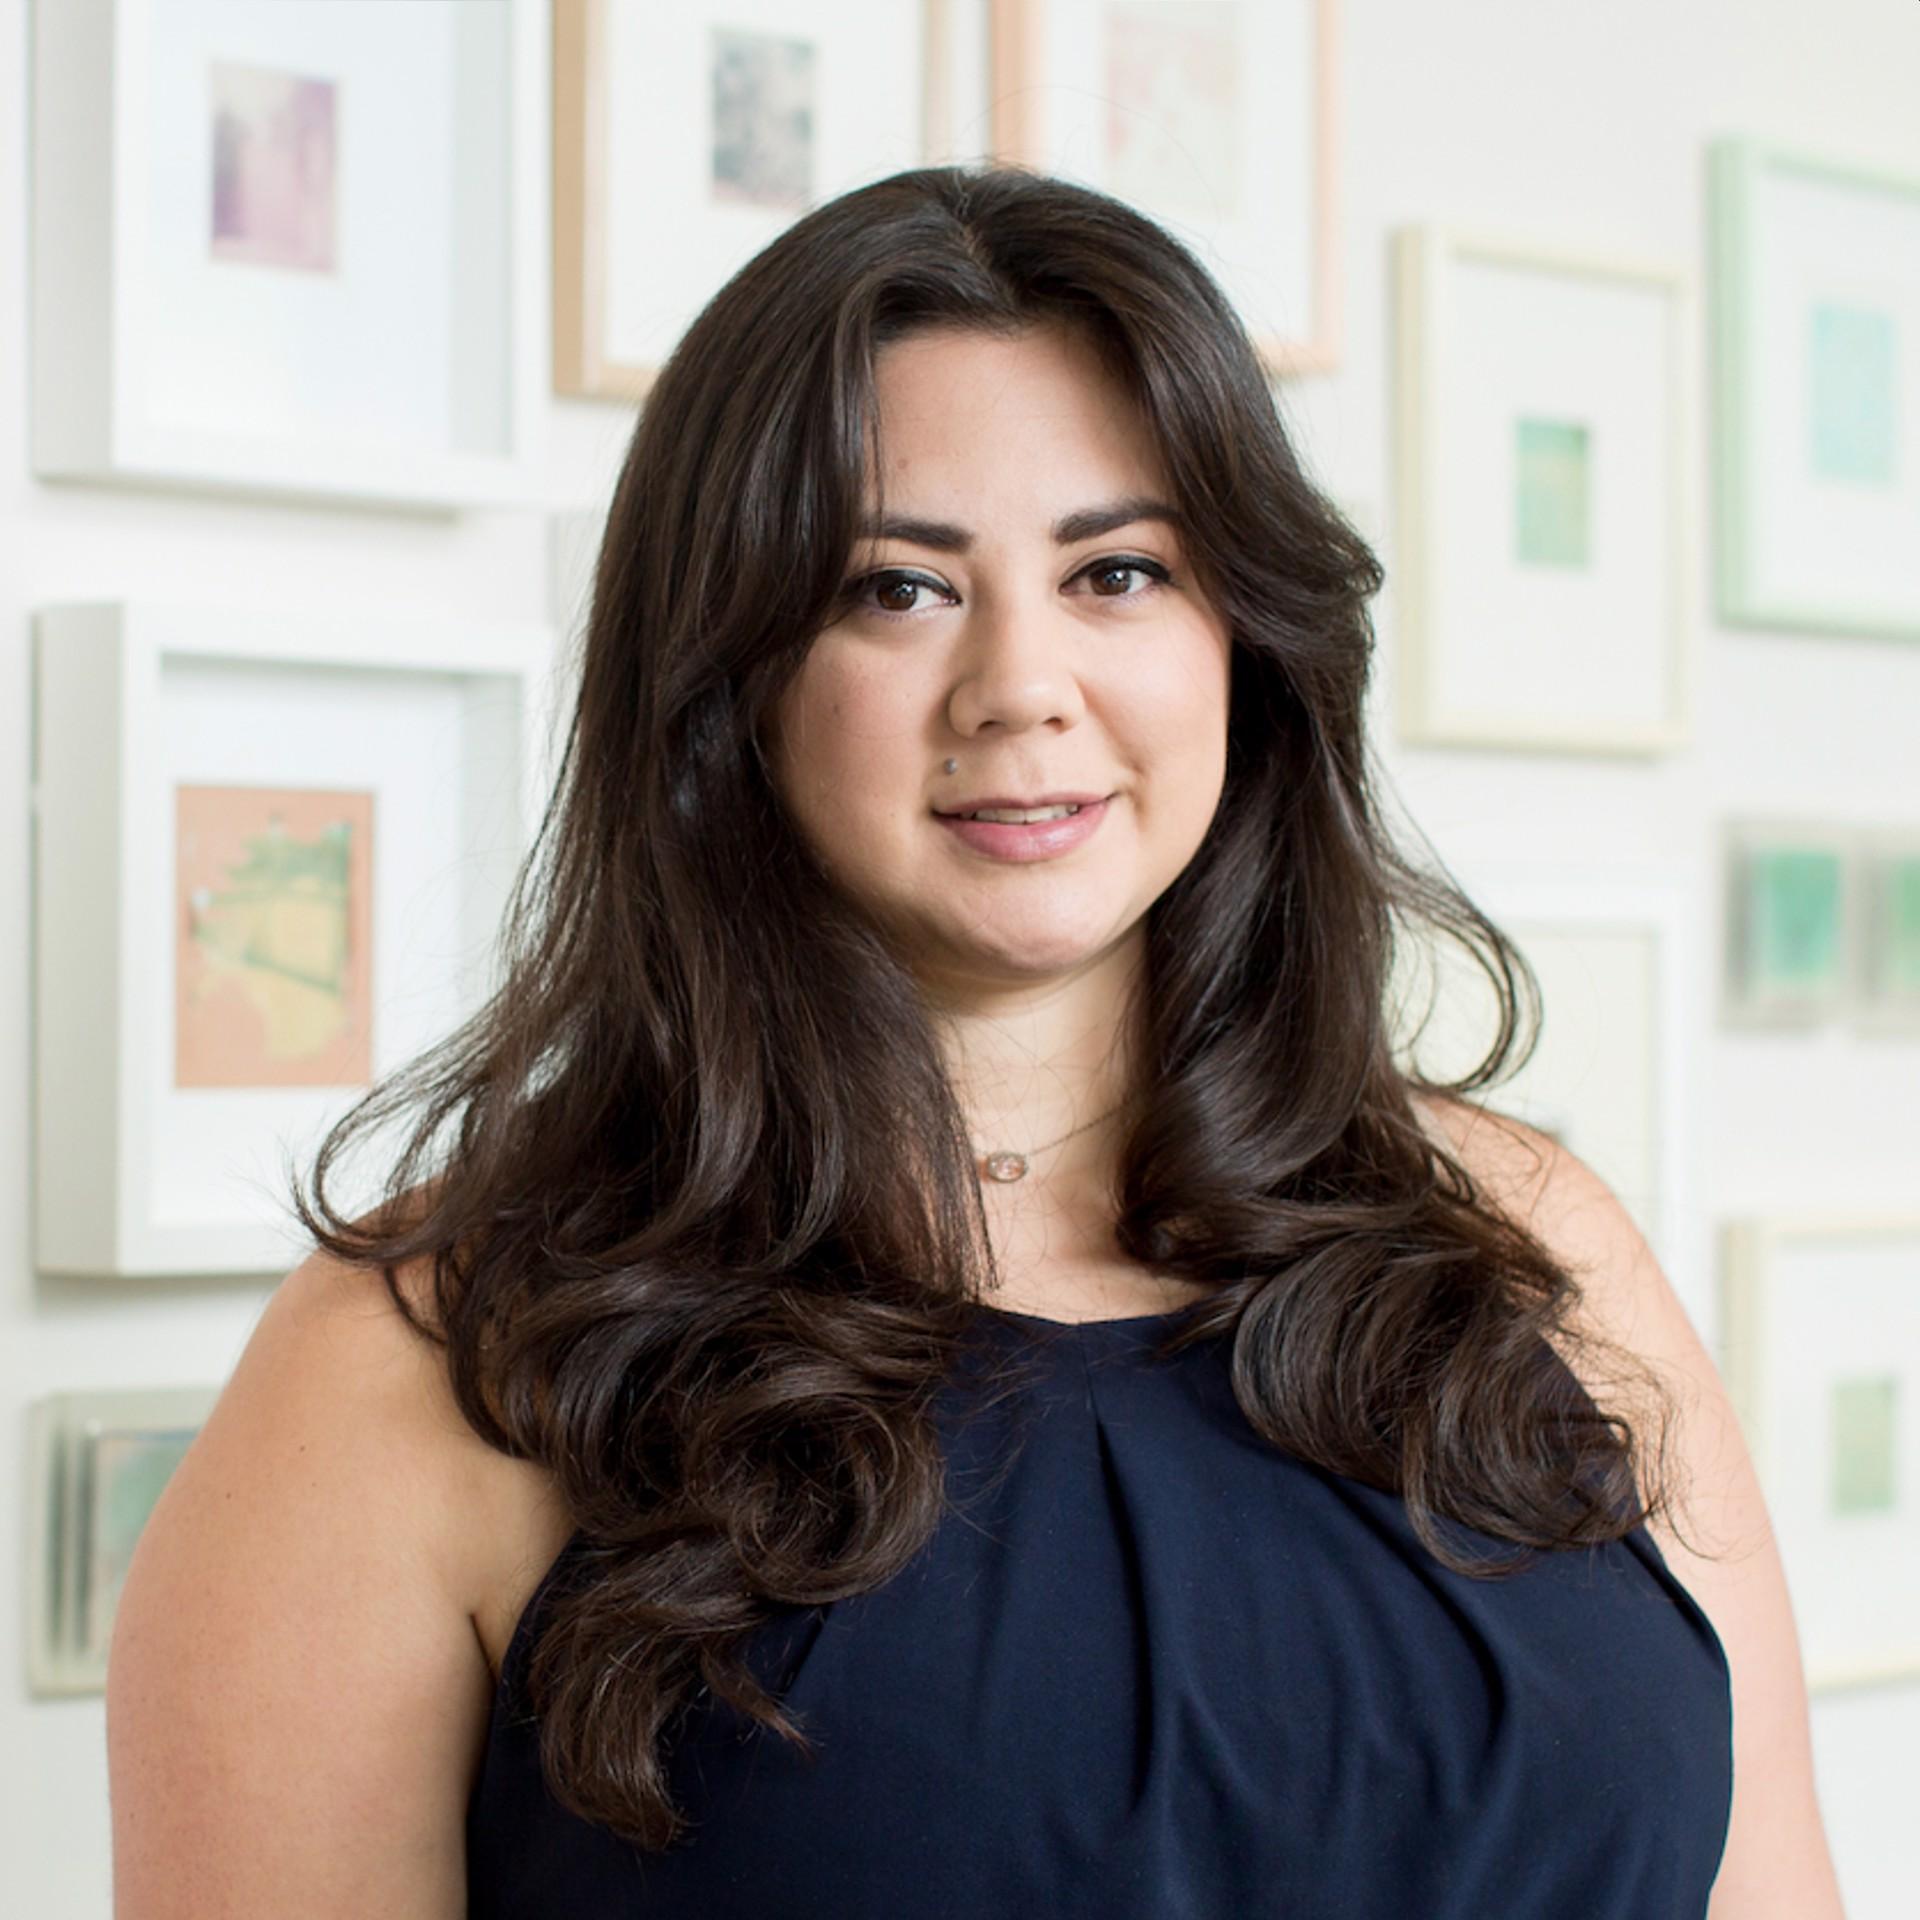 Theresa Escobedo